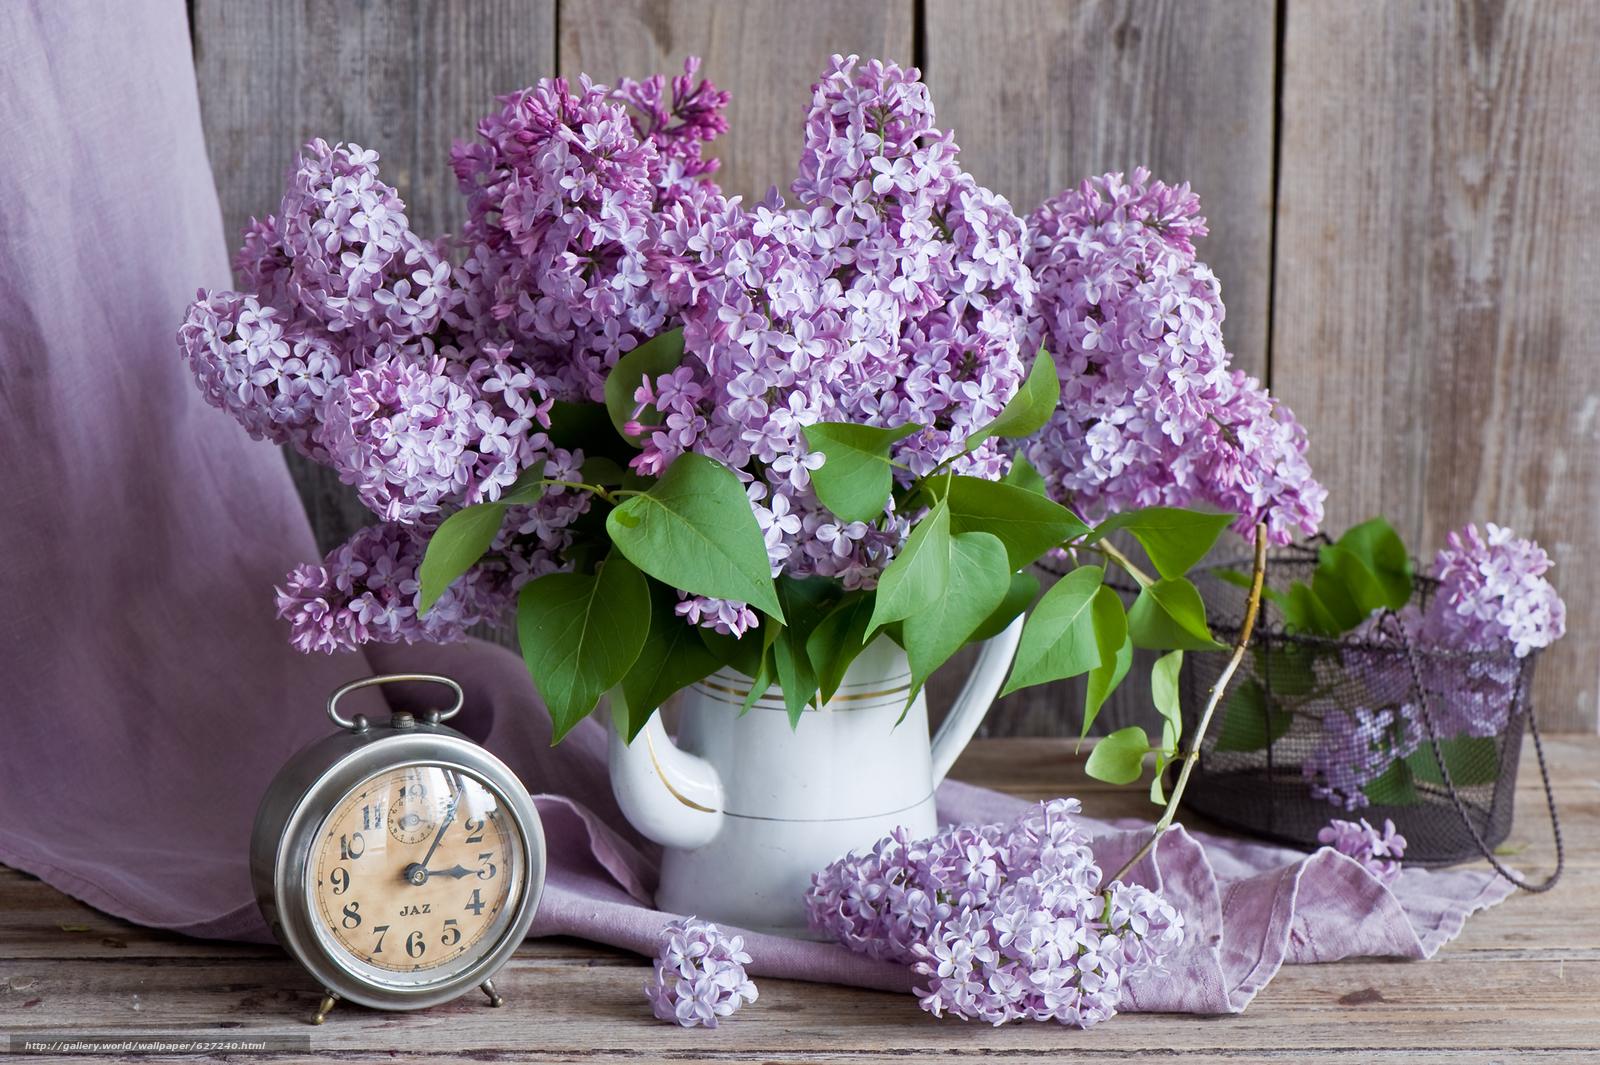 Choisir sa variété de Lilas – Au Comptoir du Jardinier